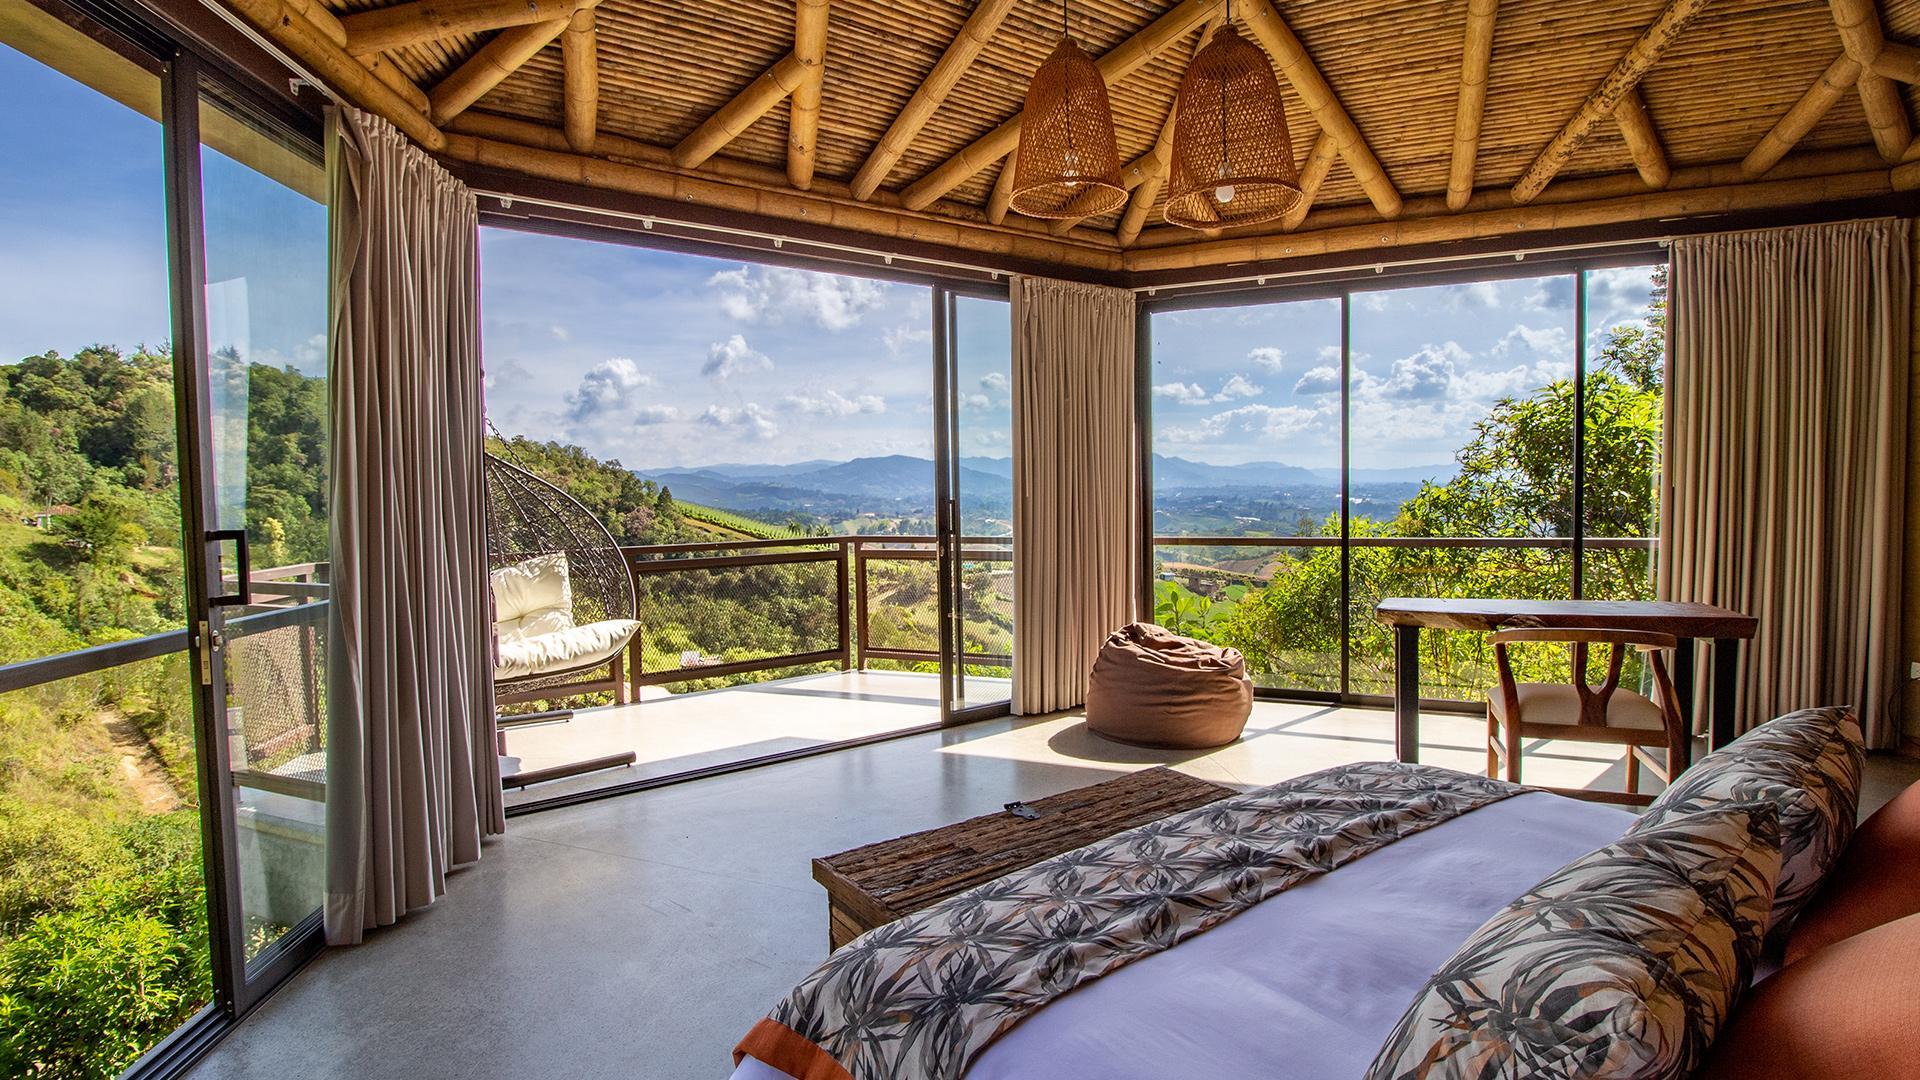 Cabaña image 1 at Cannúa Lodge by Marinilla, Antioquia, Colombia